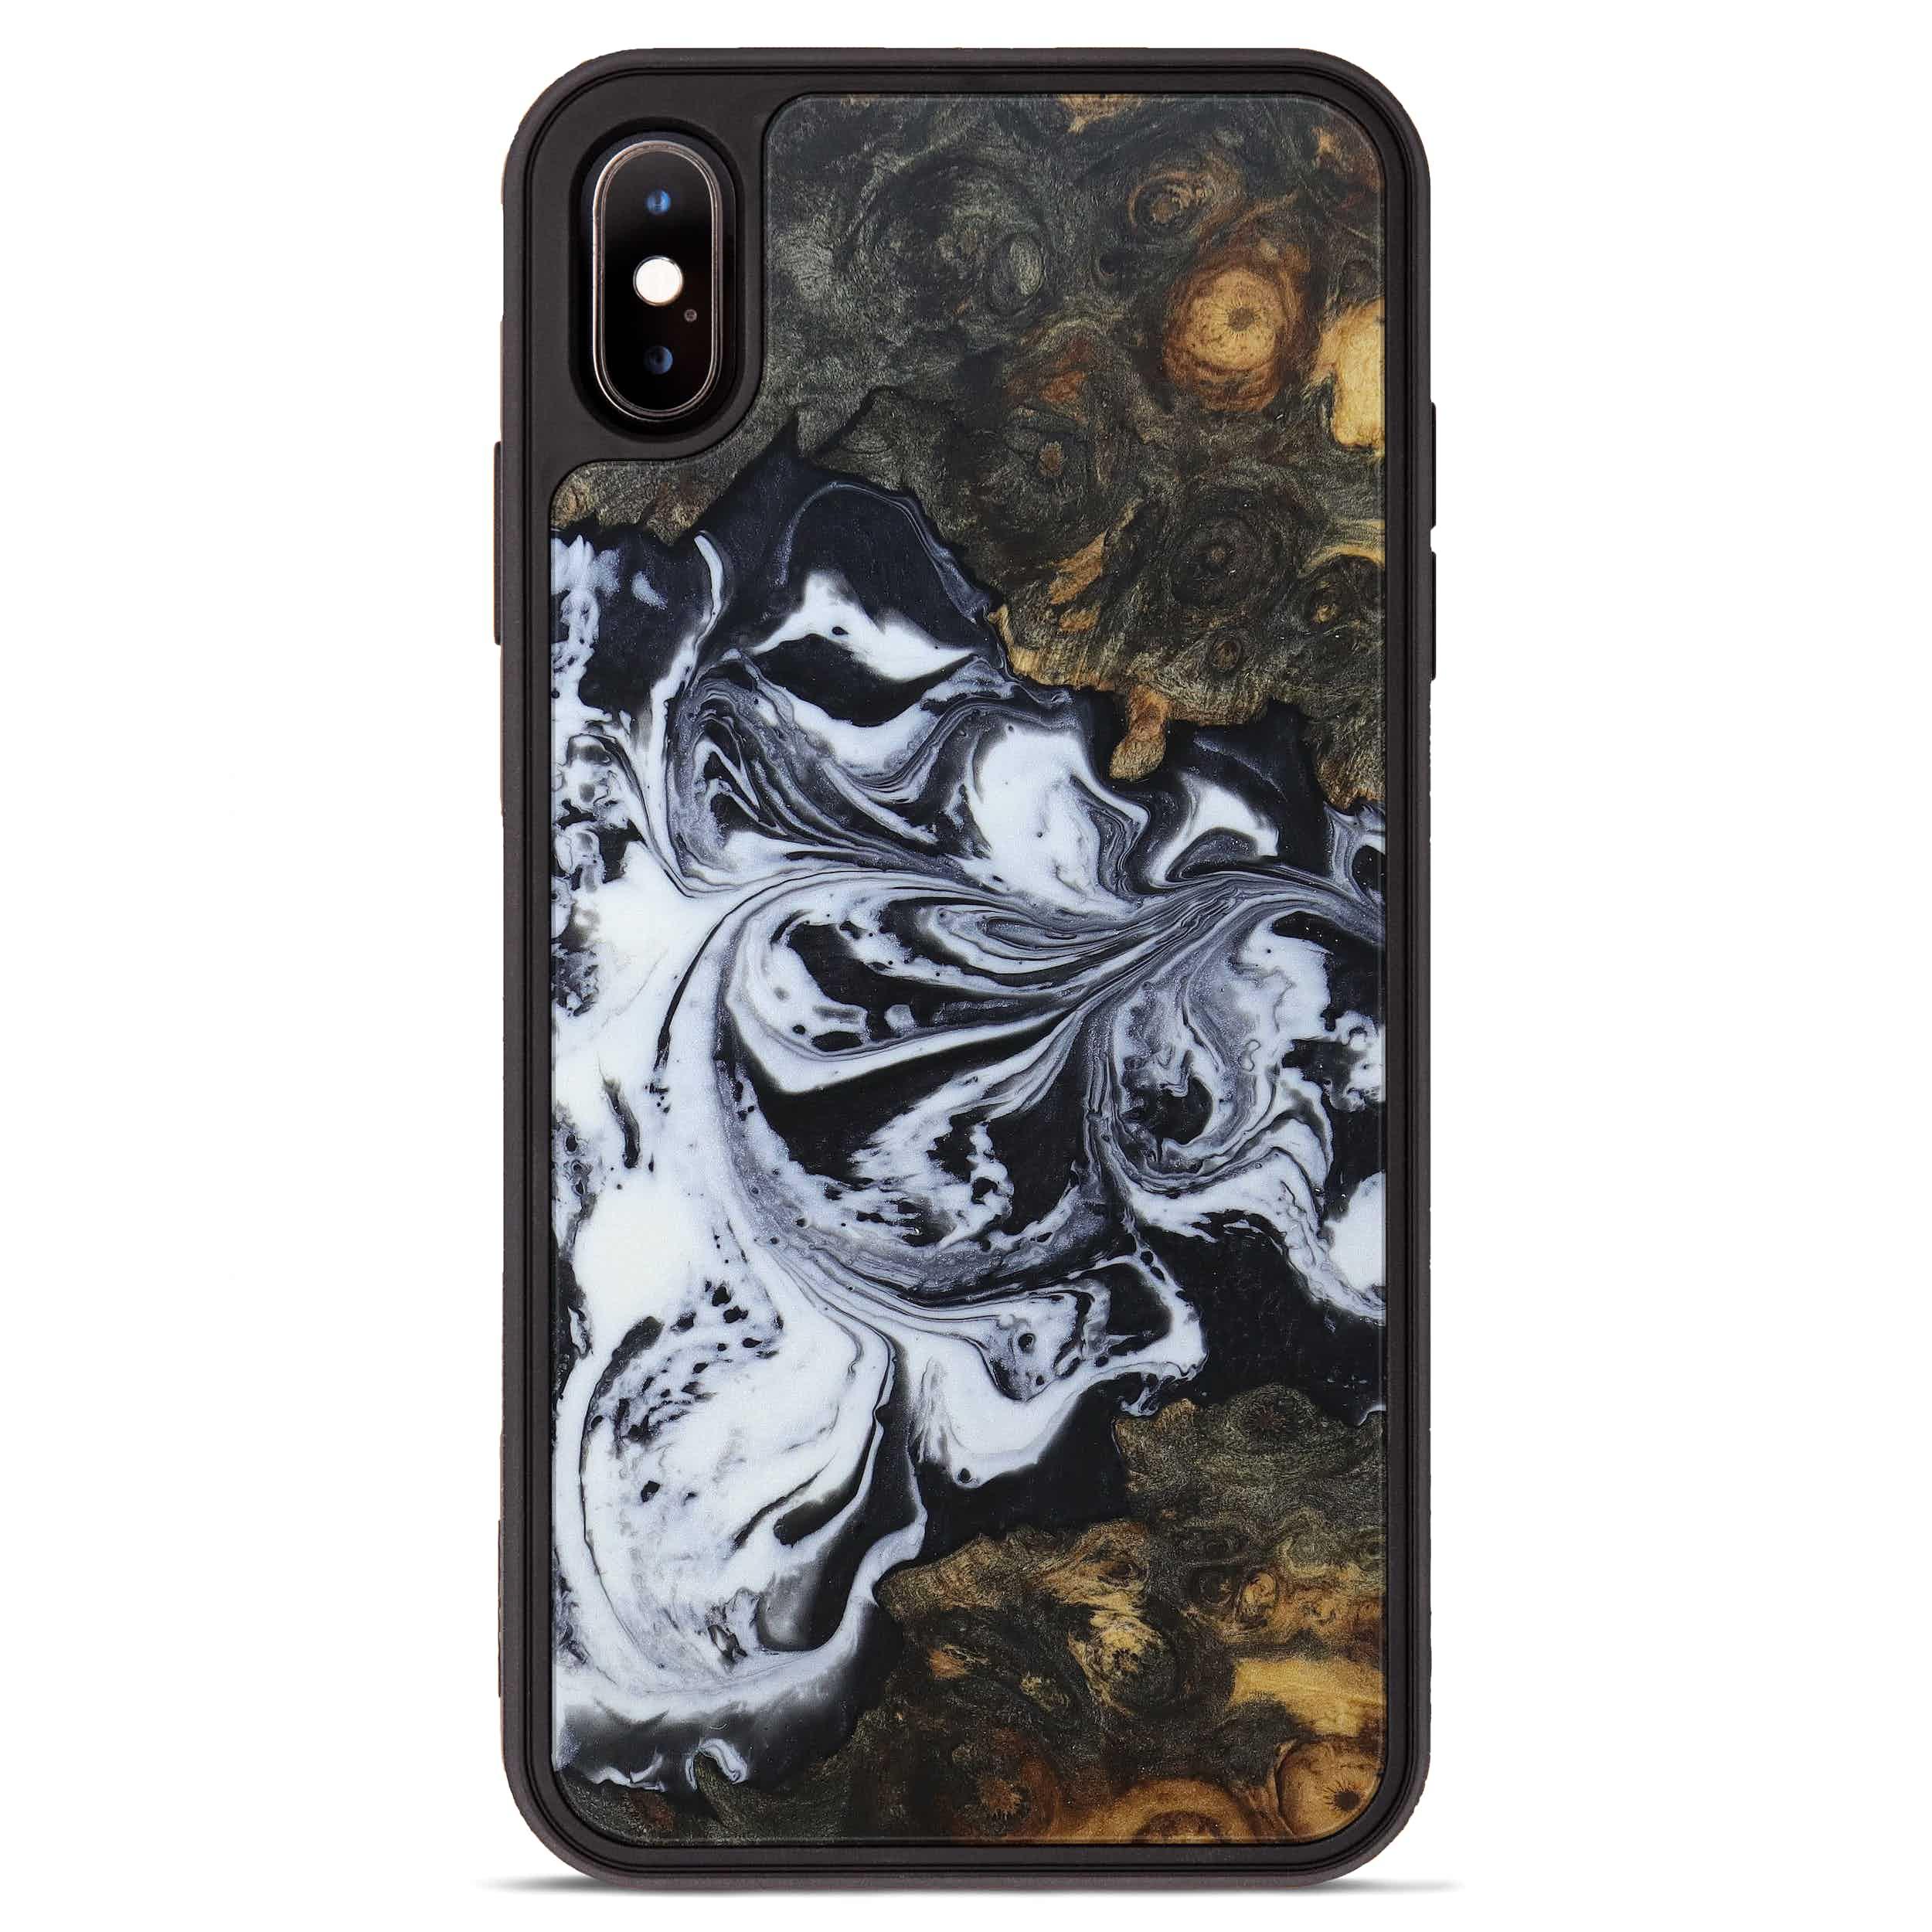 iPhone Xs Max Wood+Resin Phone Case - Lenna (Black & White, 397357)